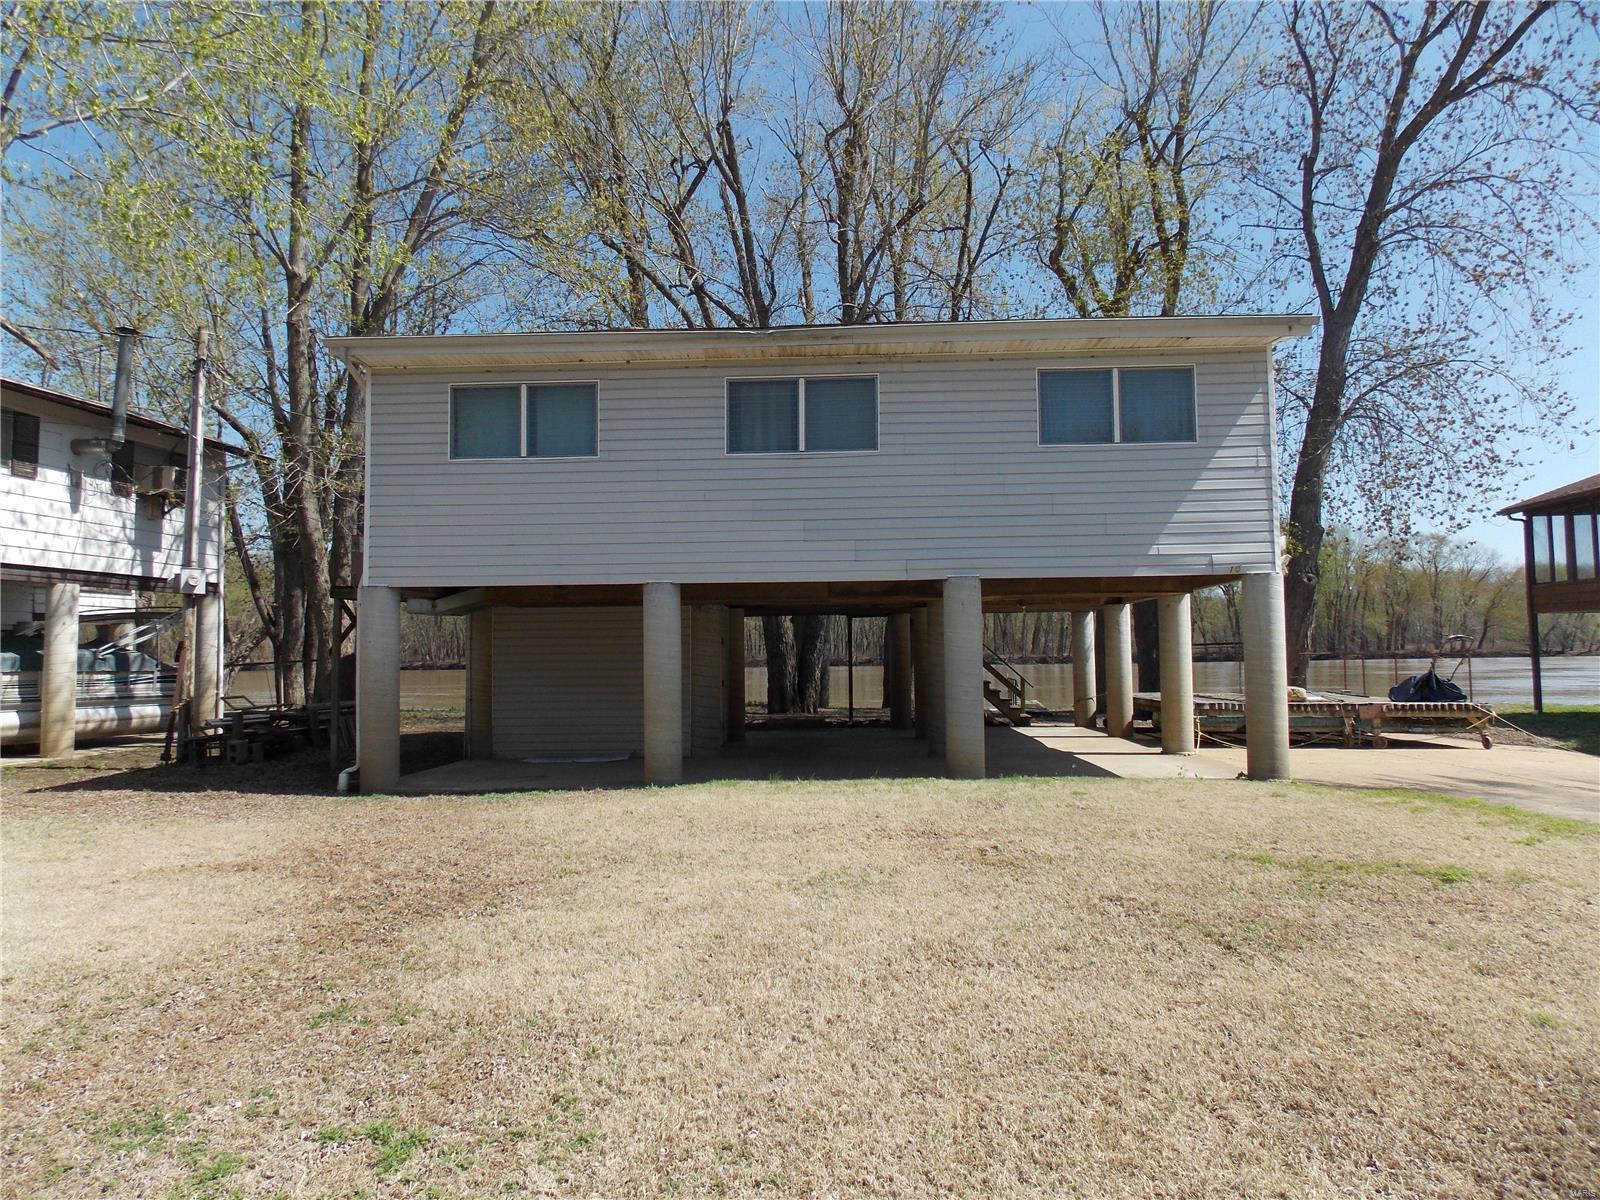 38844 Pike 9203 Property Photo - Annada, MO real estate listing